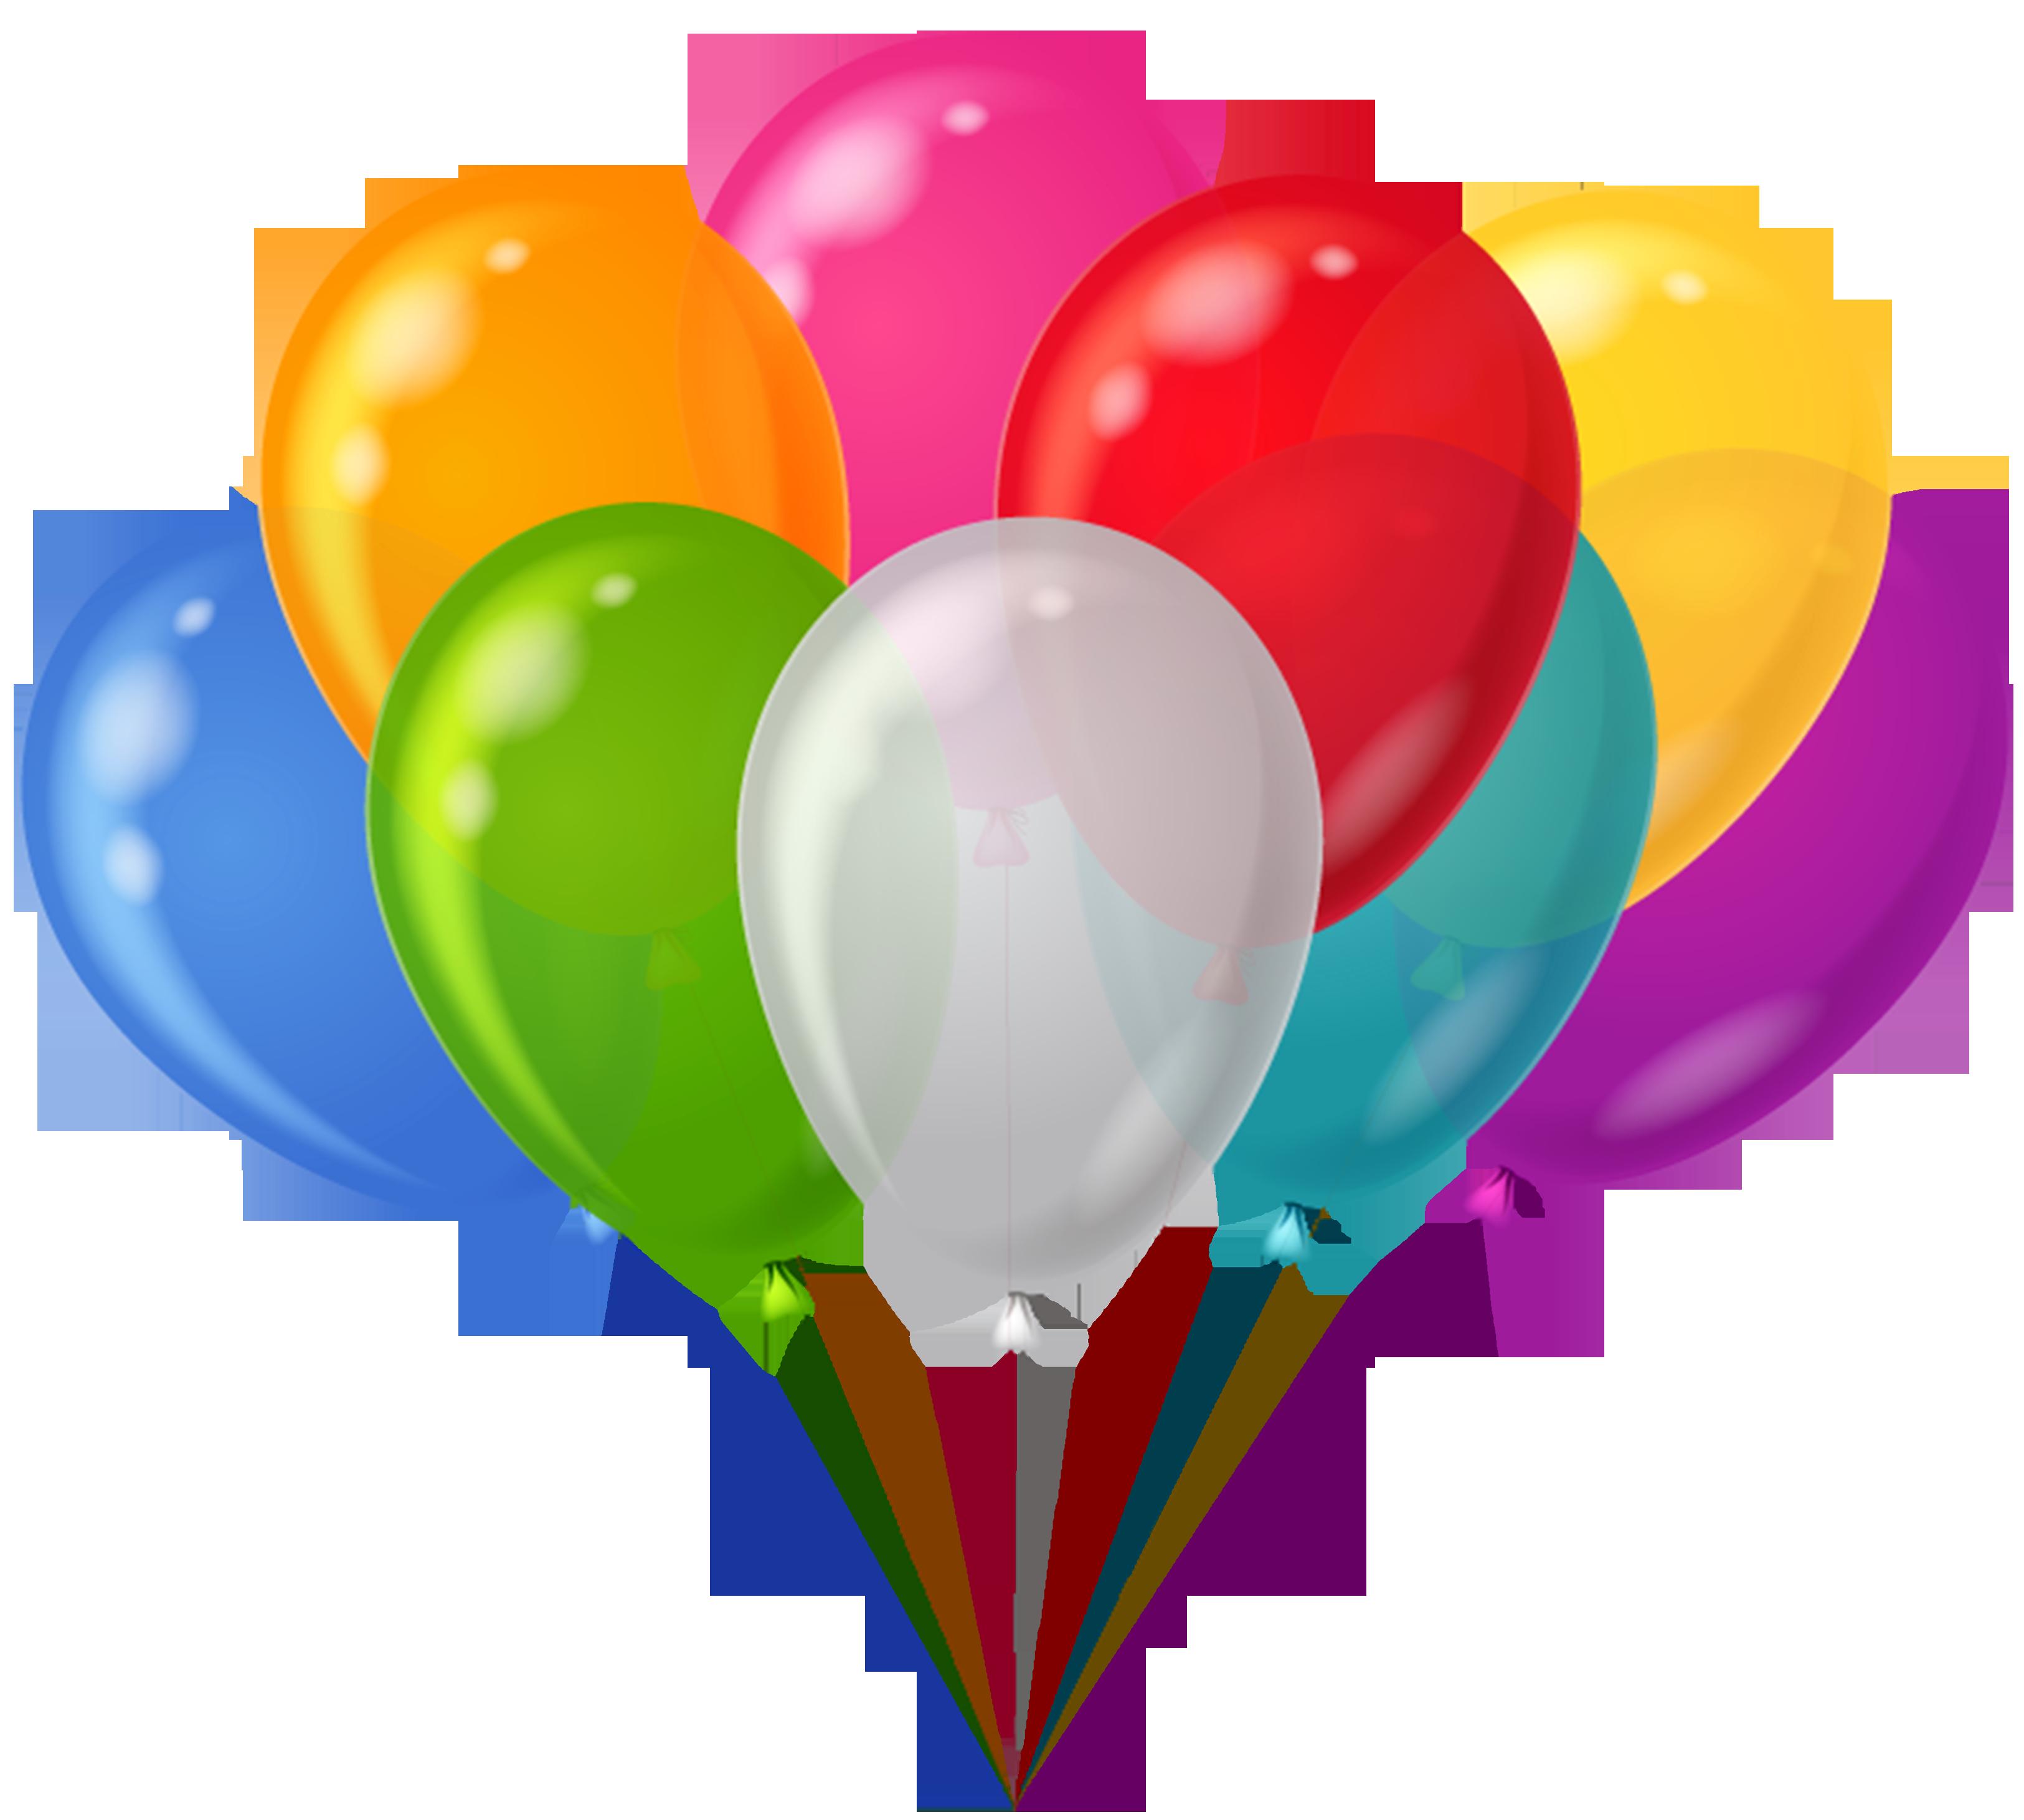 Ballons Clip Art